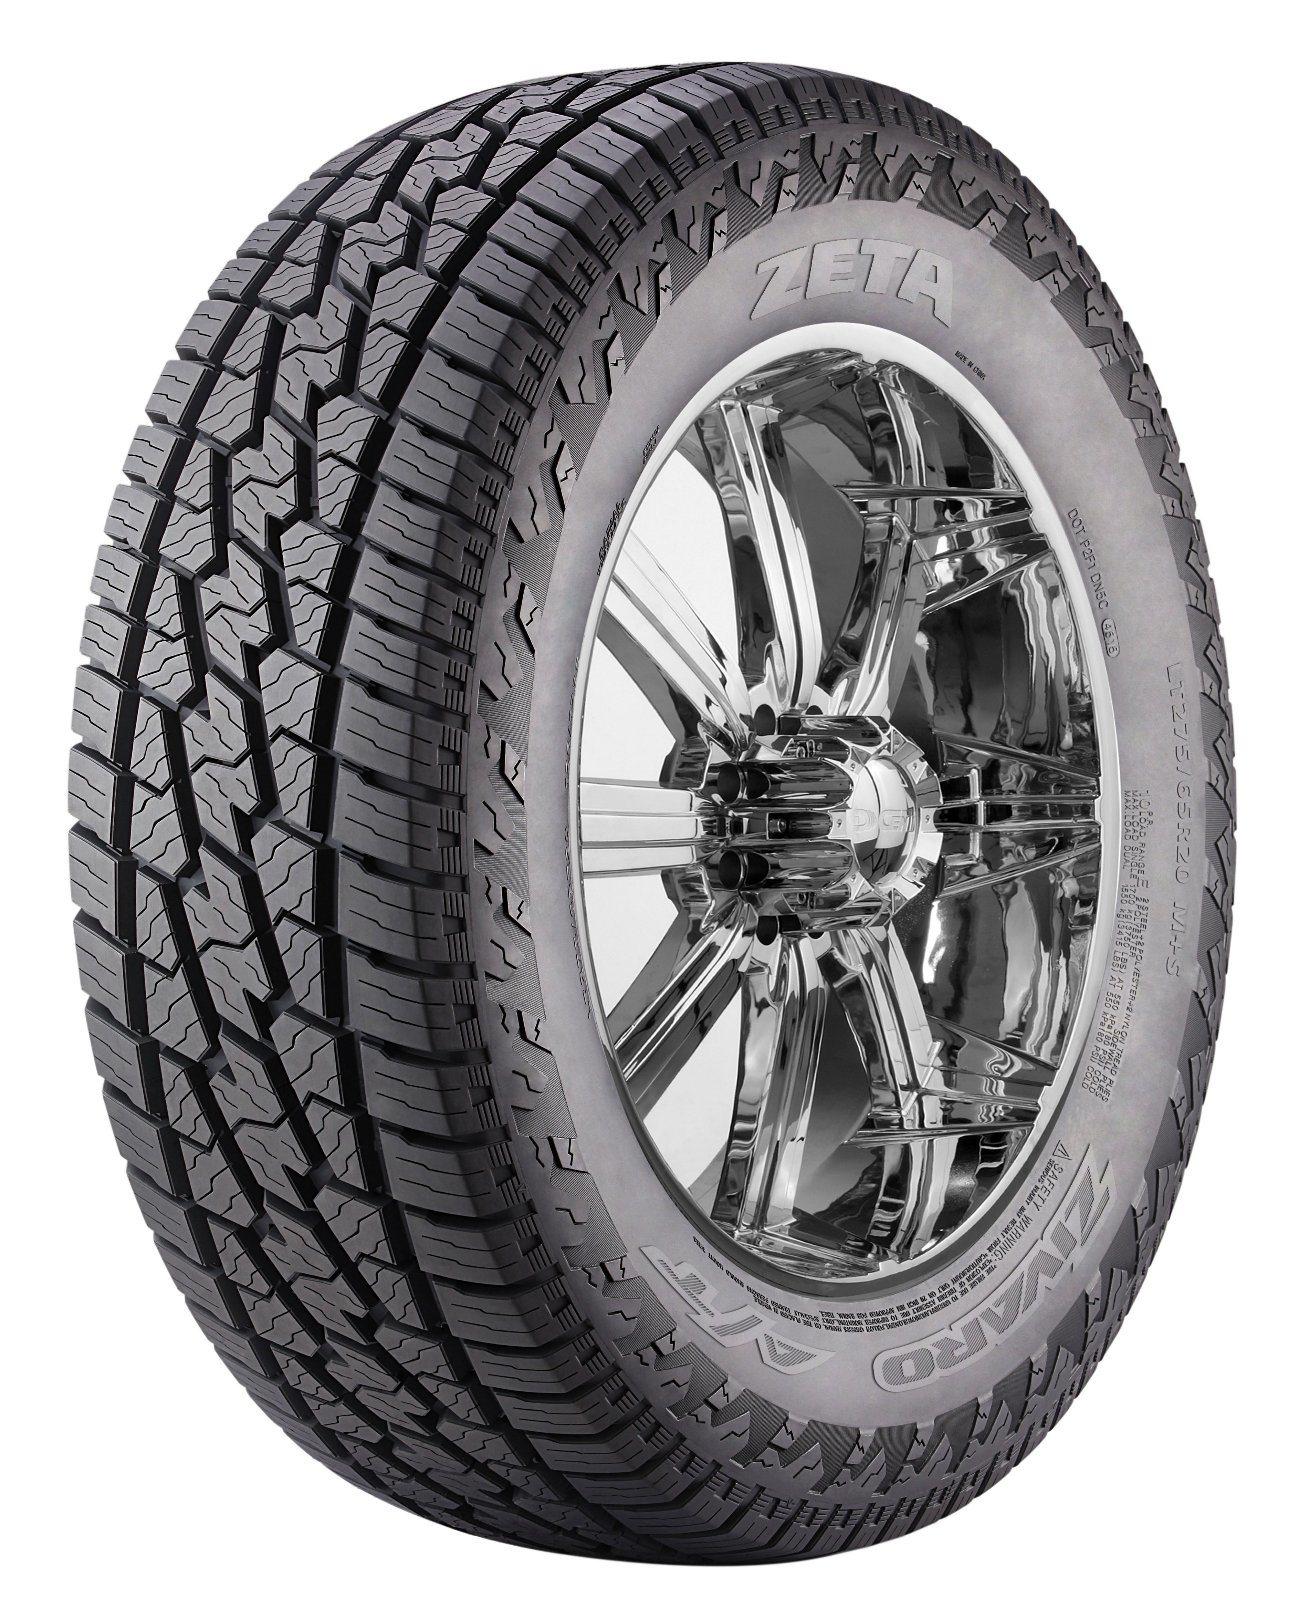 Cheap Car Tires >> Hot Item China Tyre Manufacturer Lt215 85r16 Lt235 85r16 Lt235 80r17 Cheap Car Tires